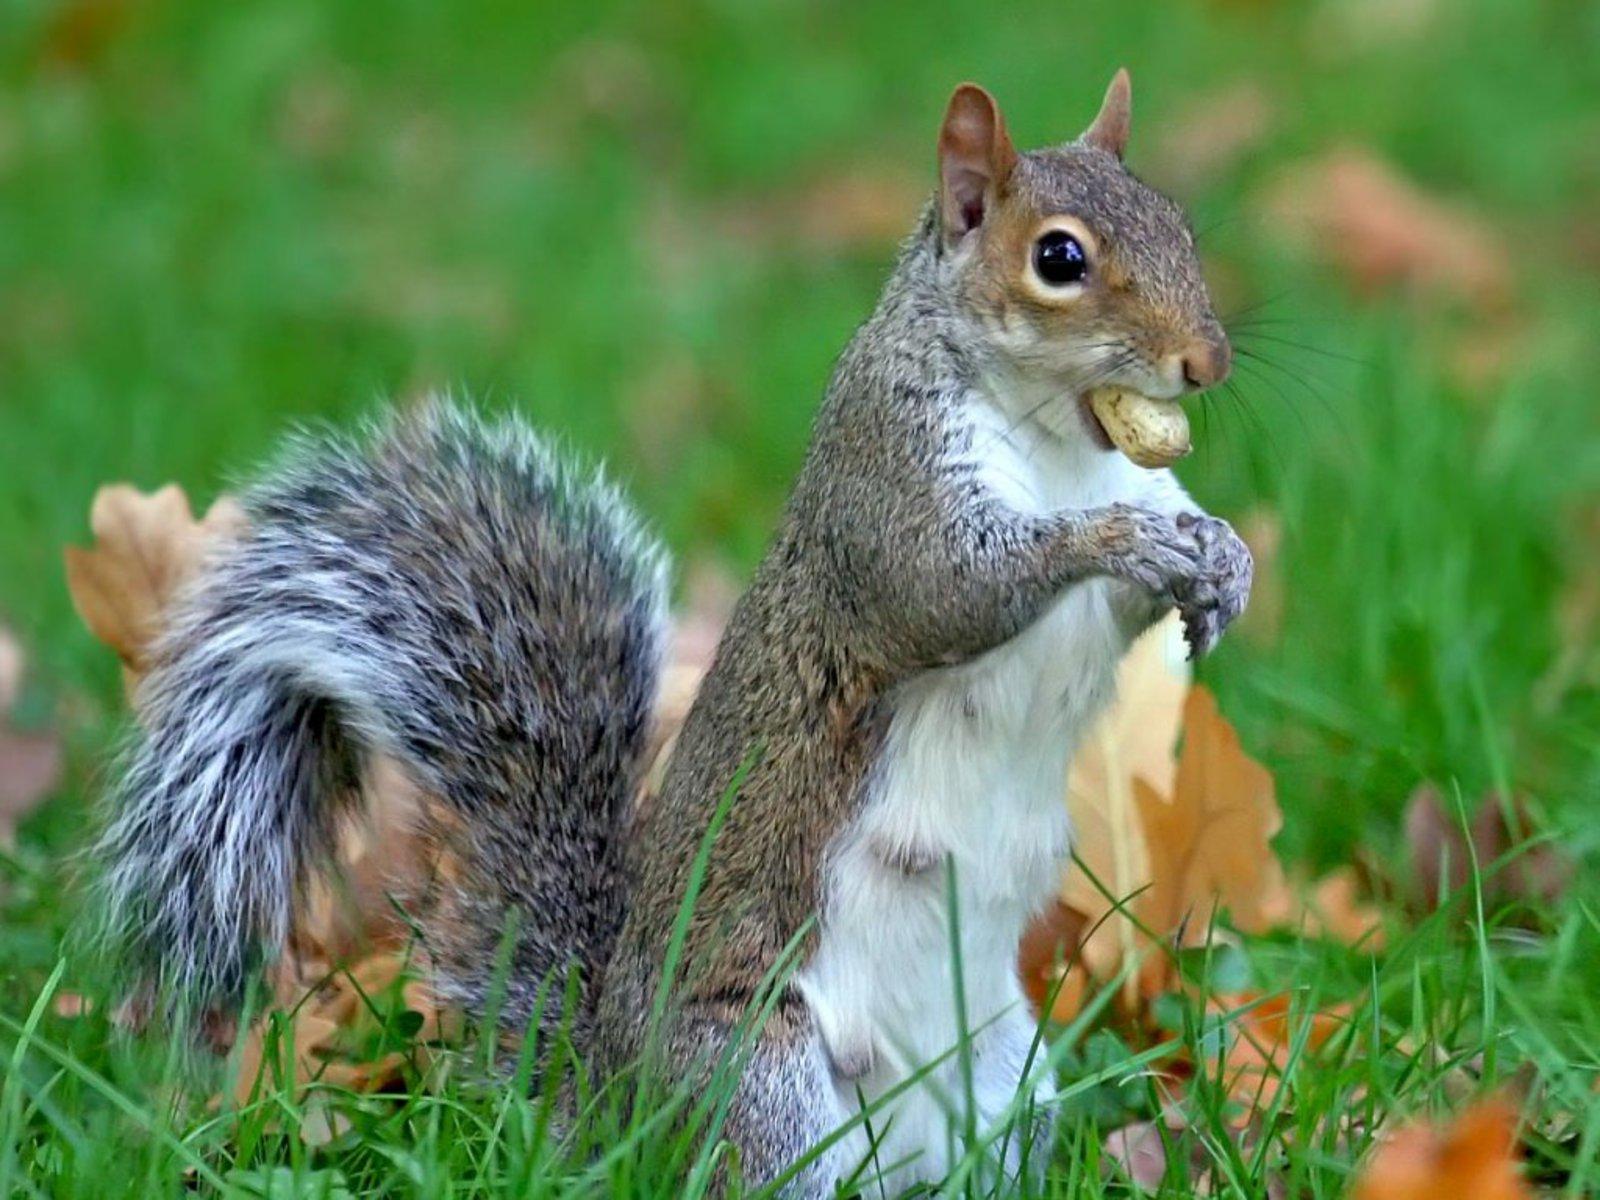 gray squirrel wallpaper - photo #6